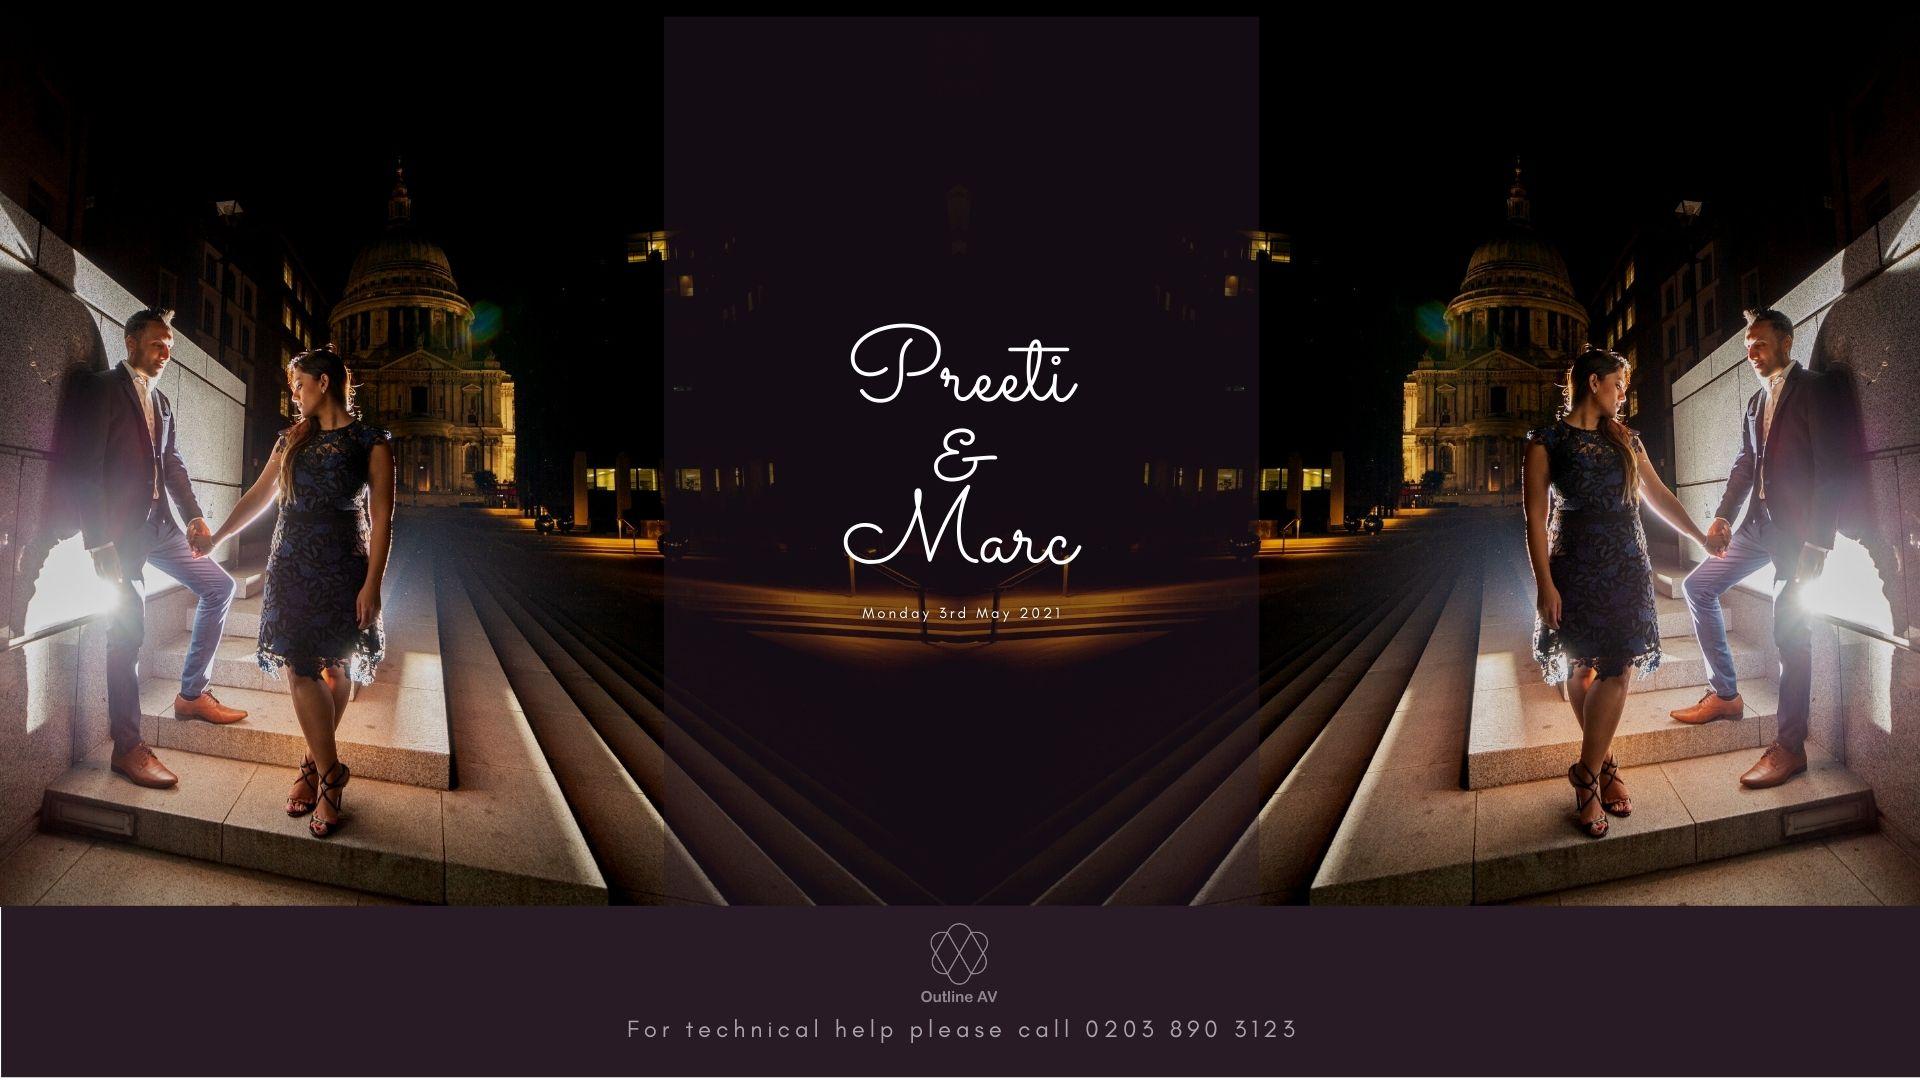 Priti & Marc v2 - Live Stream